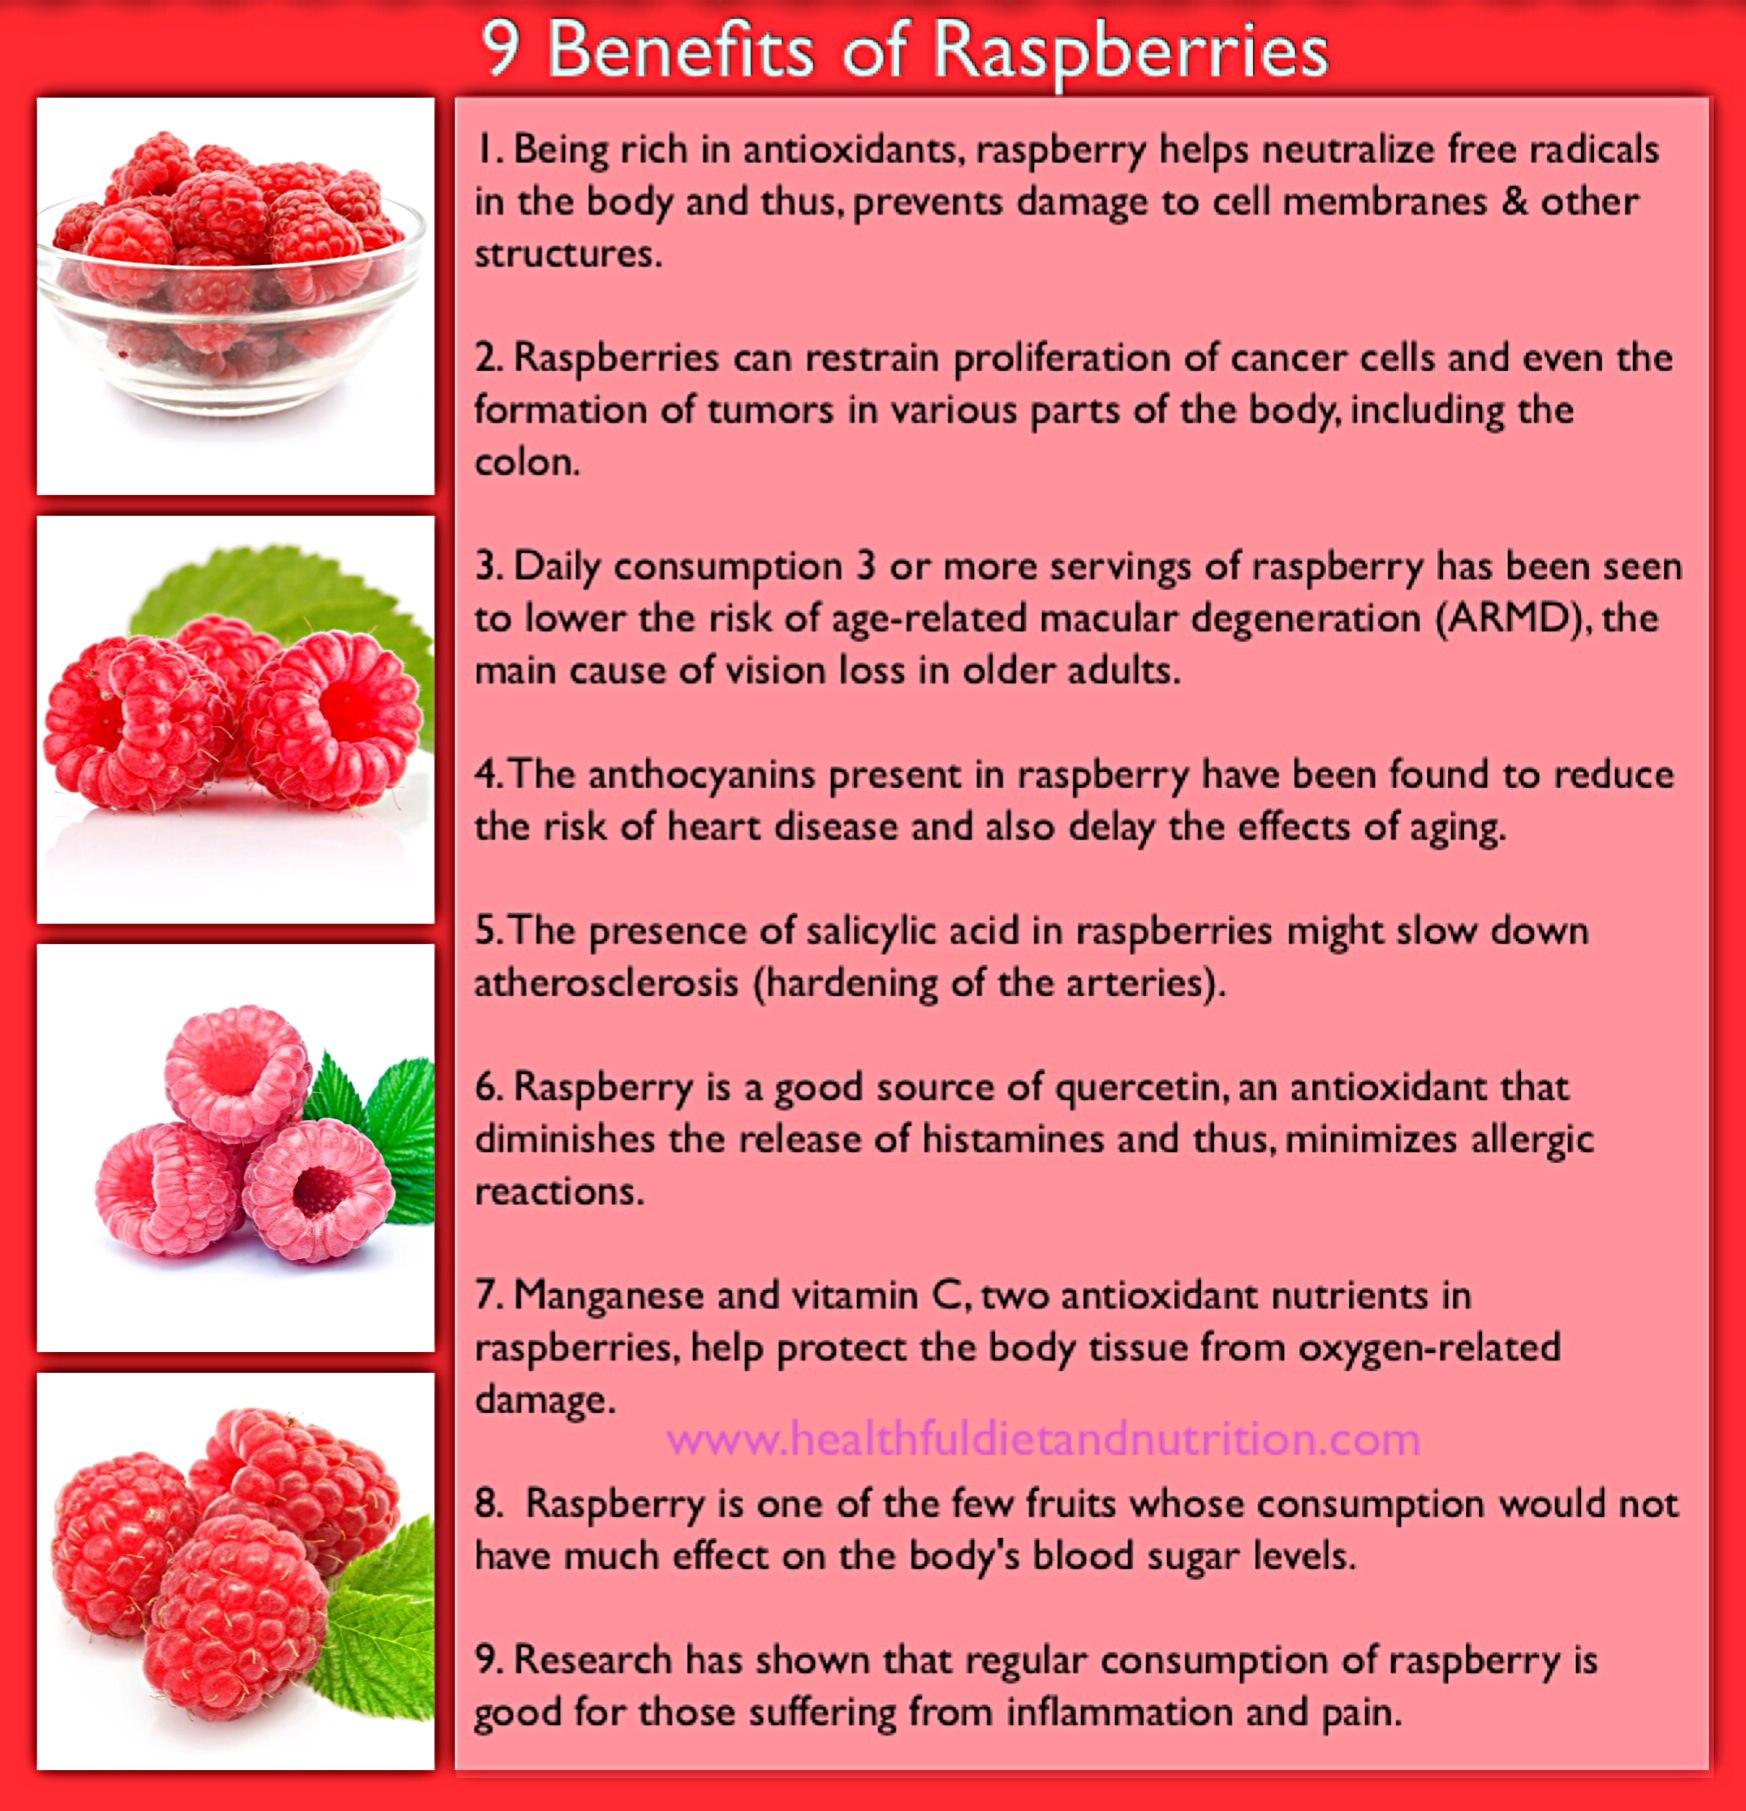 9 Benefits of Raspberries